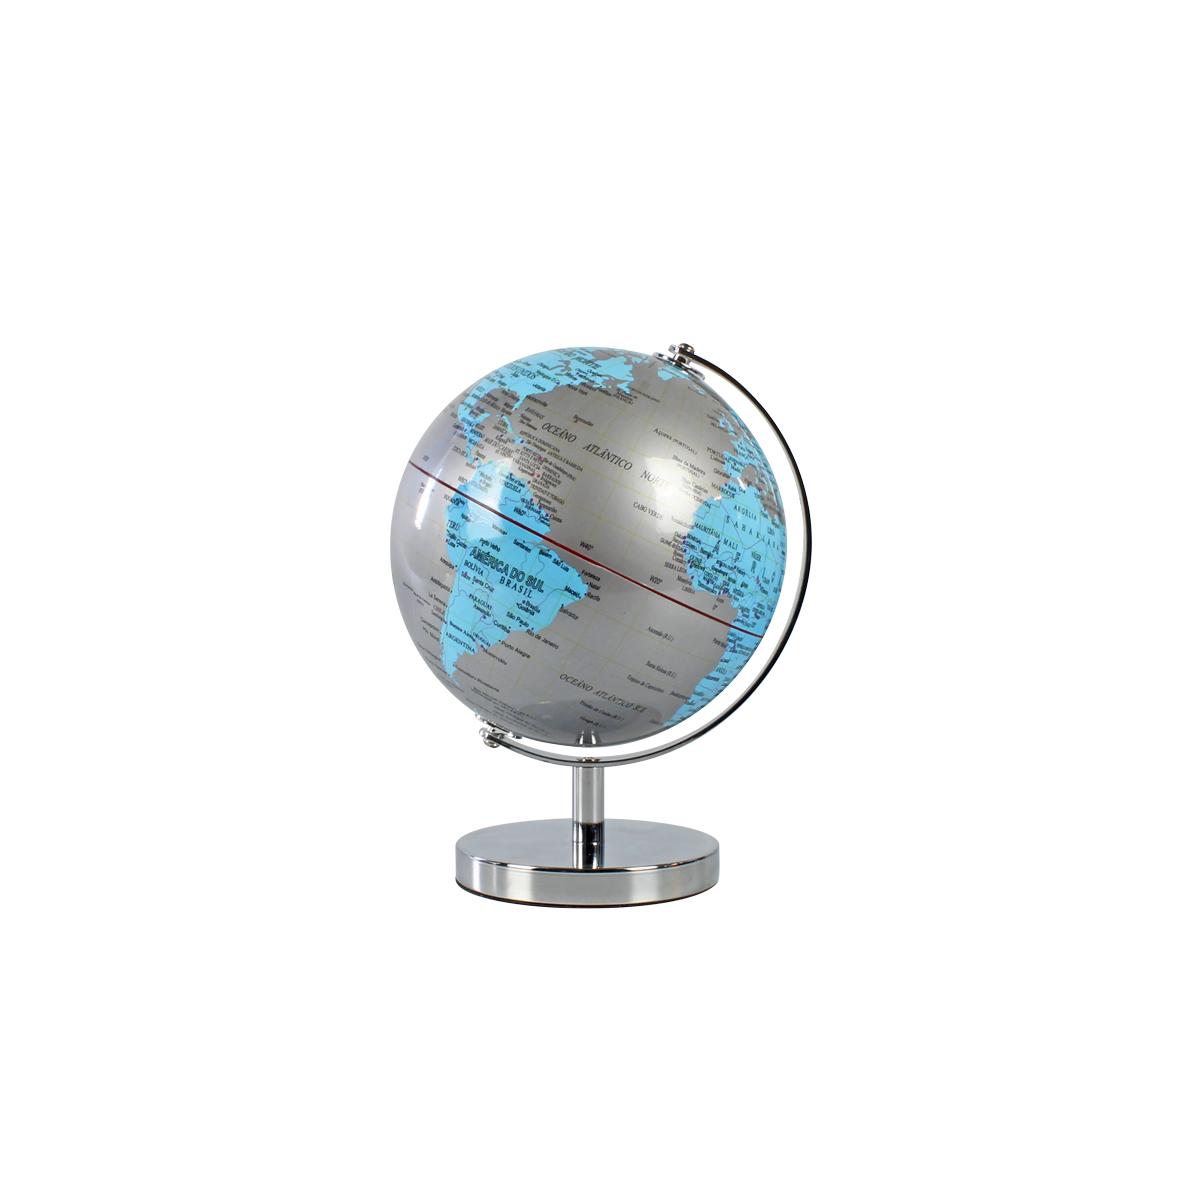 Mini Globo Terrestre Decorativo Edição Luxo Silver & Blue 18cm